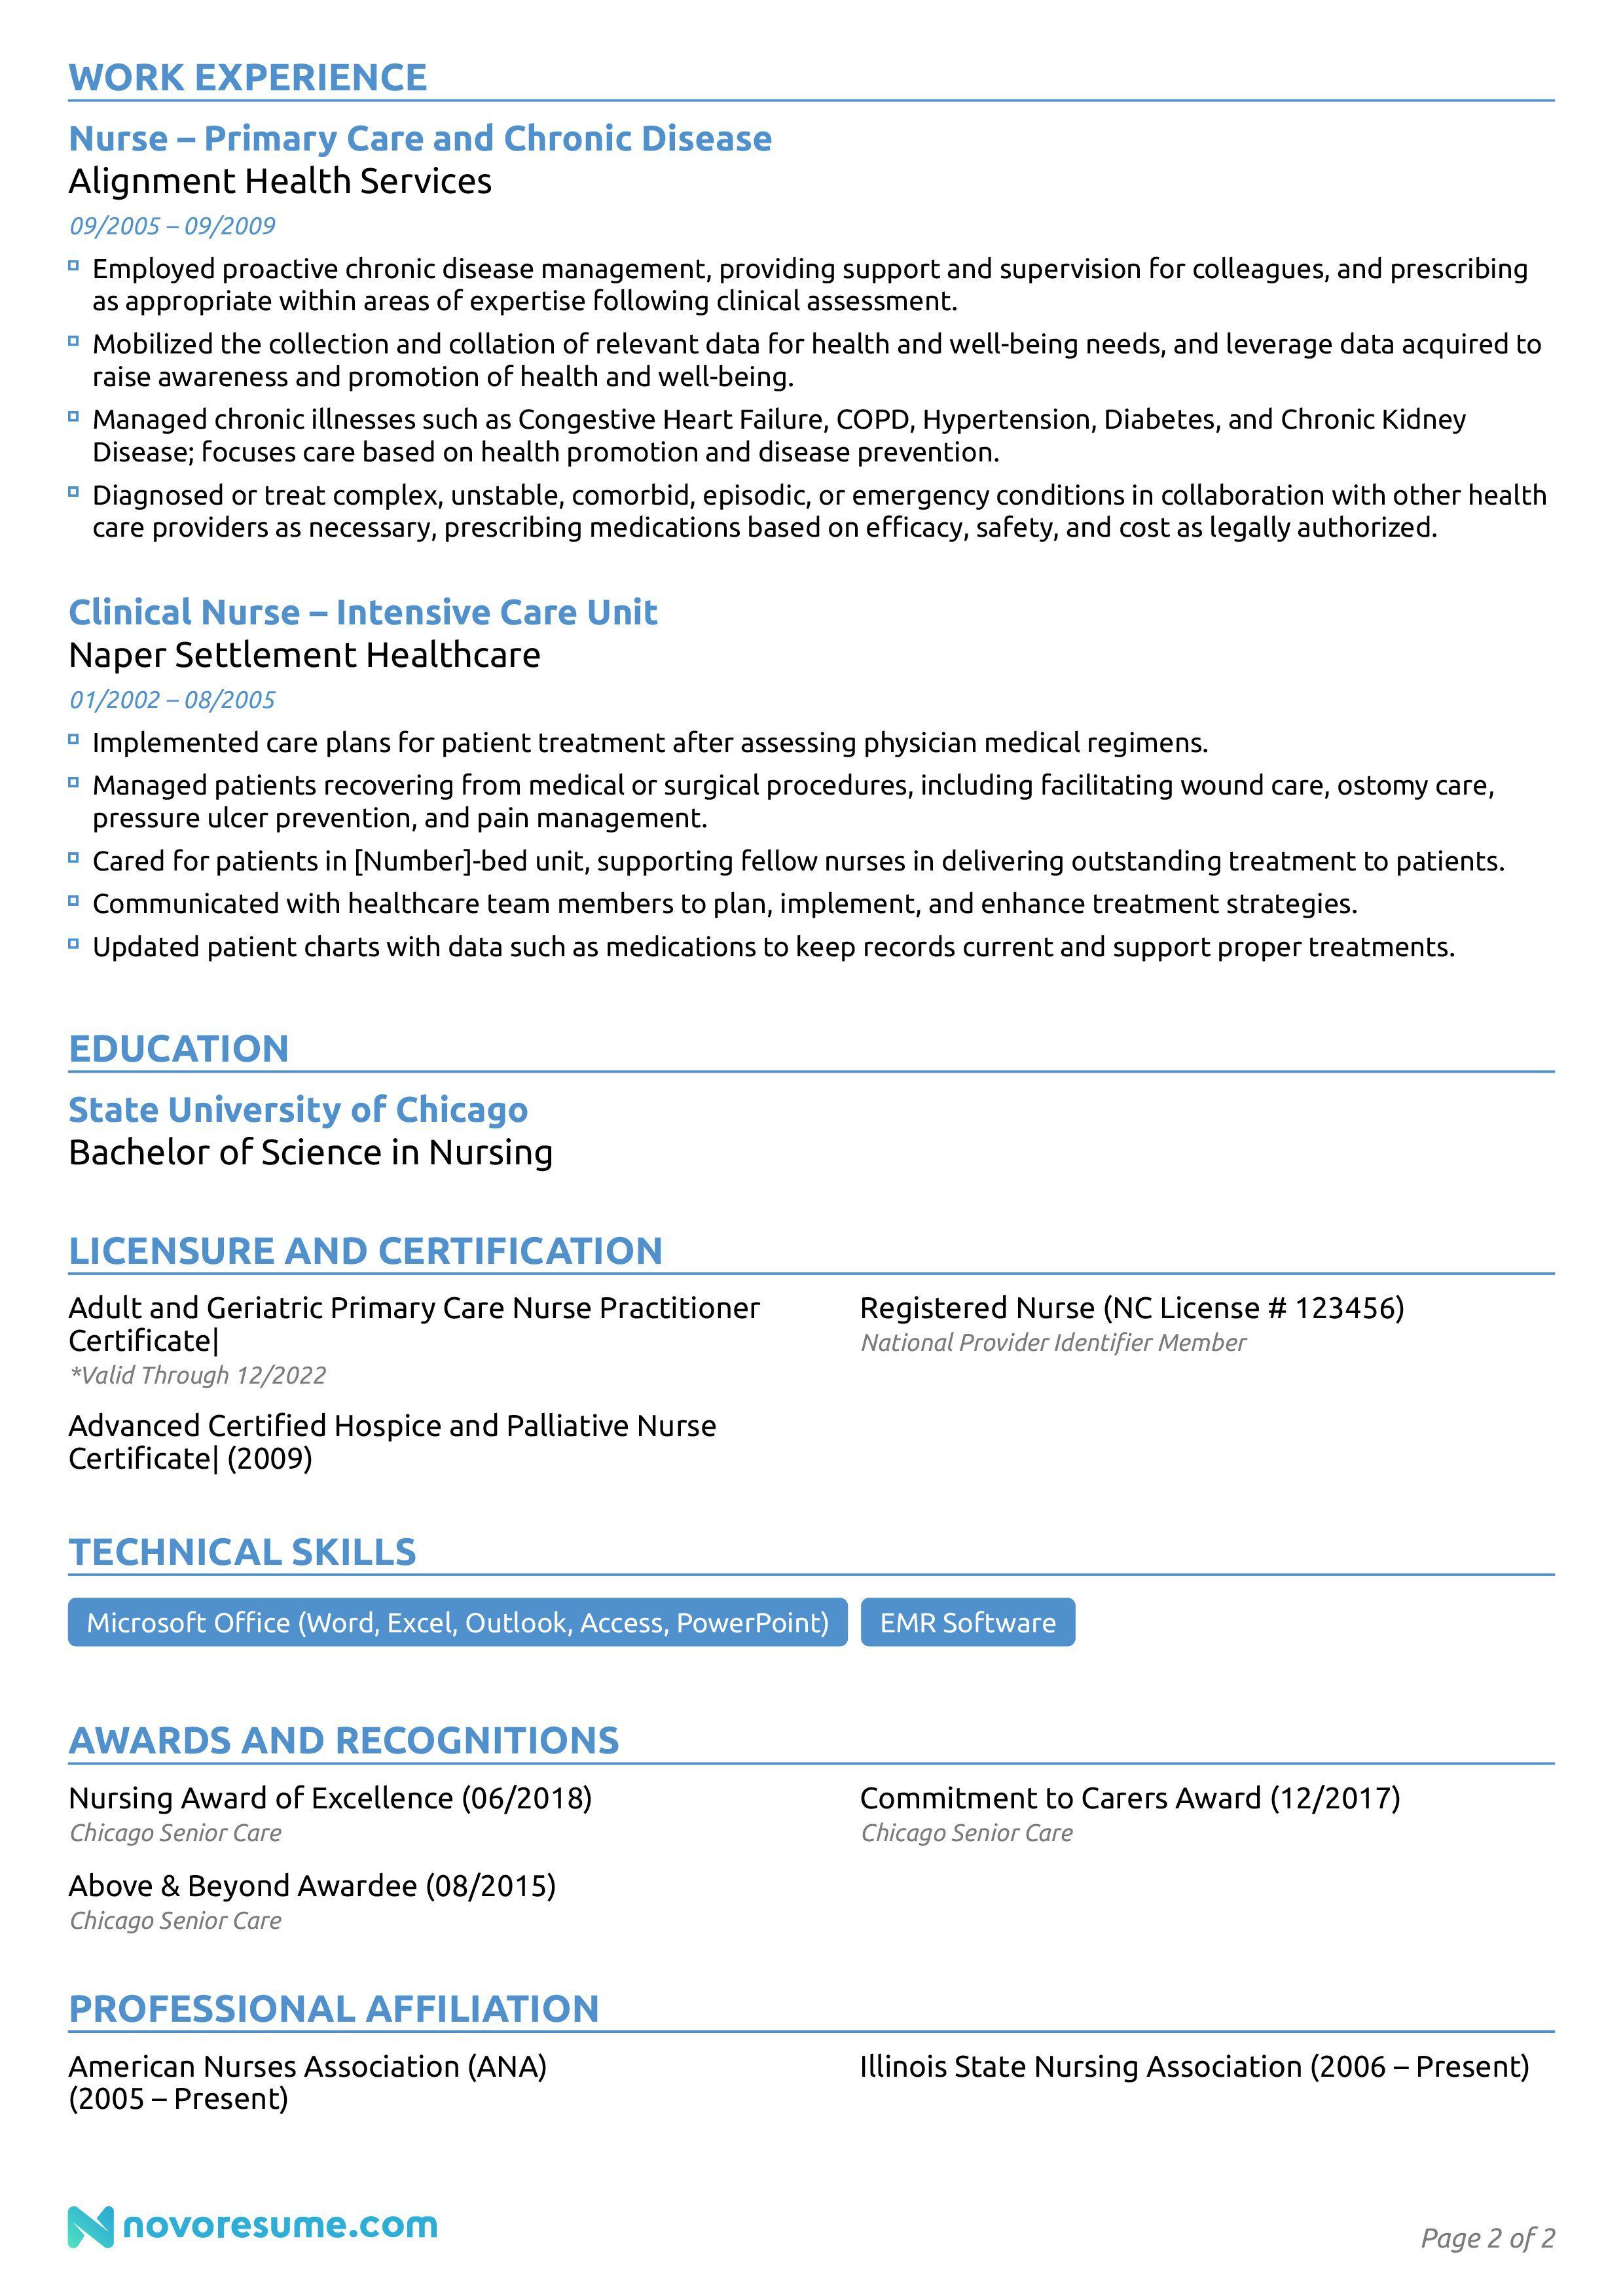 008 Stupendou Nursing Resume Template Word High Def  Free Microsoft Nurse Cv Download RegisteredFull